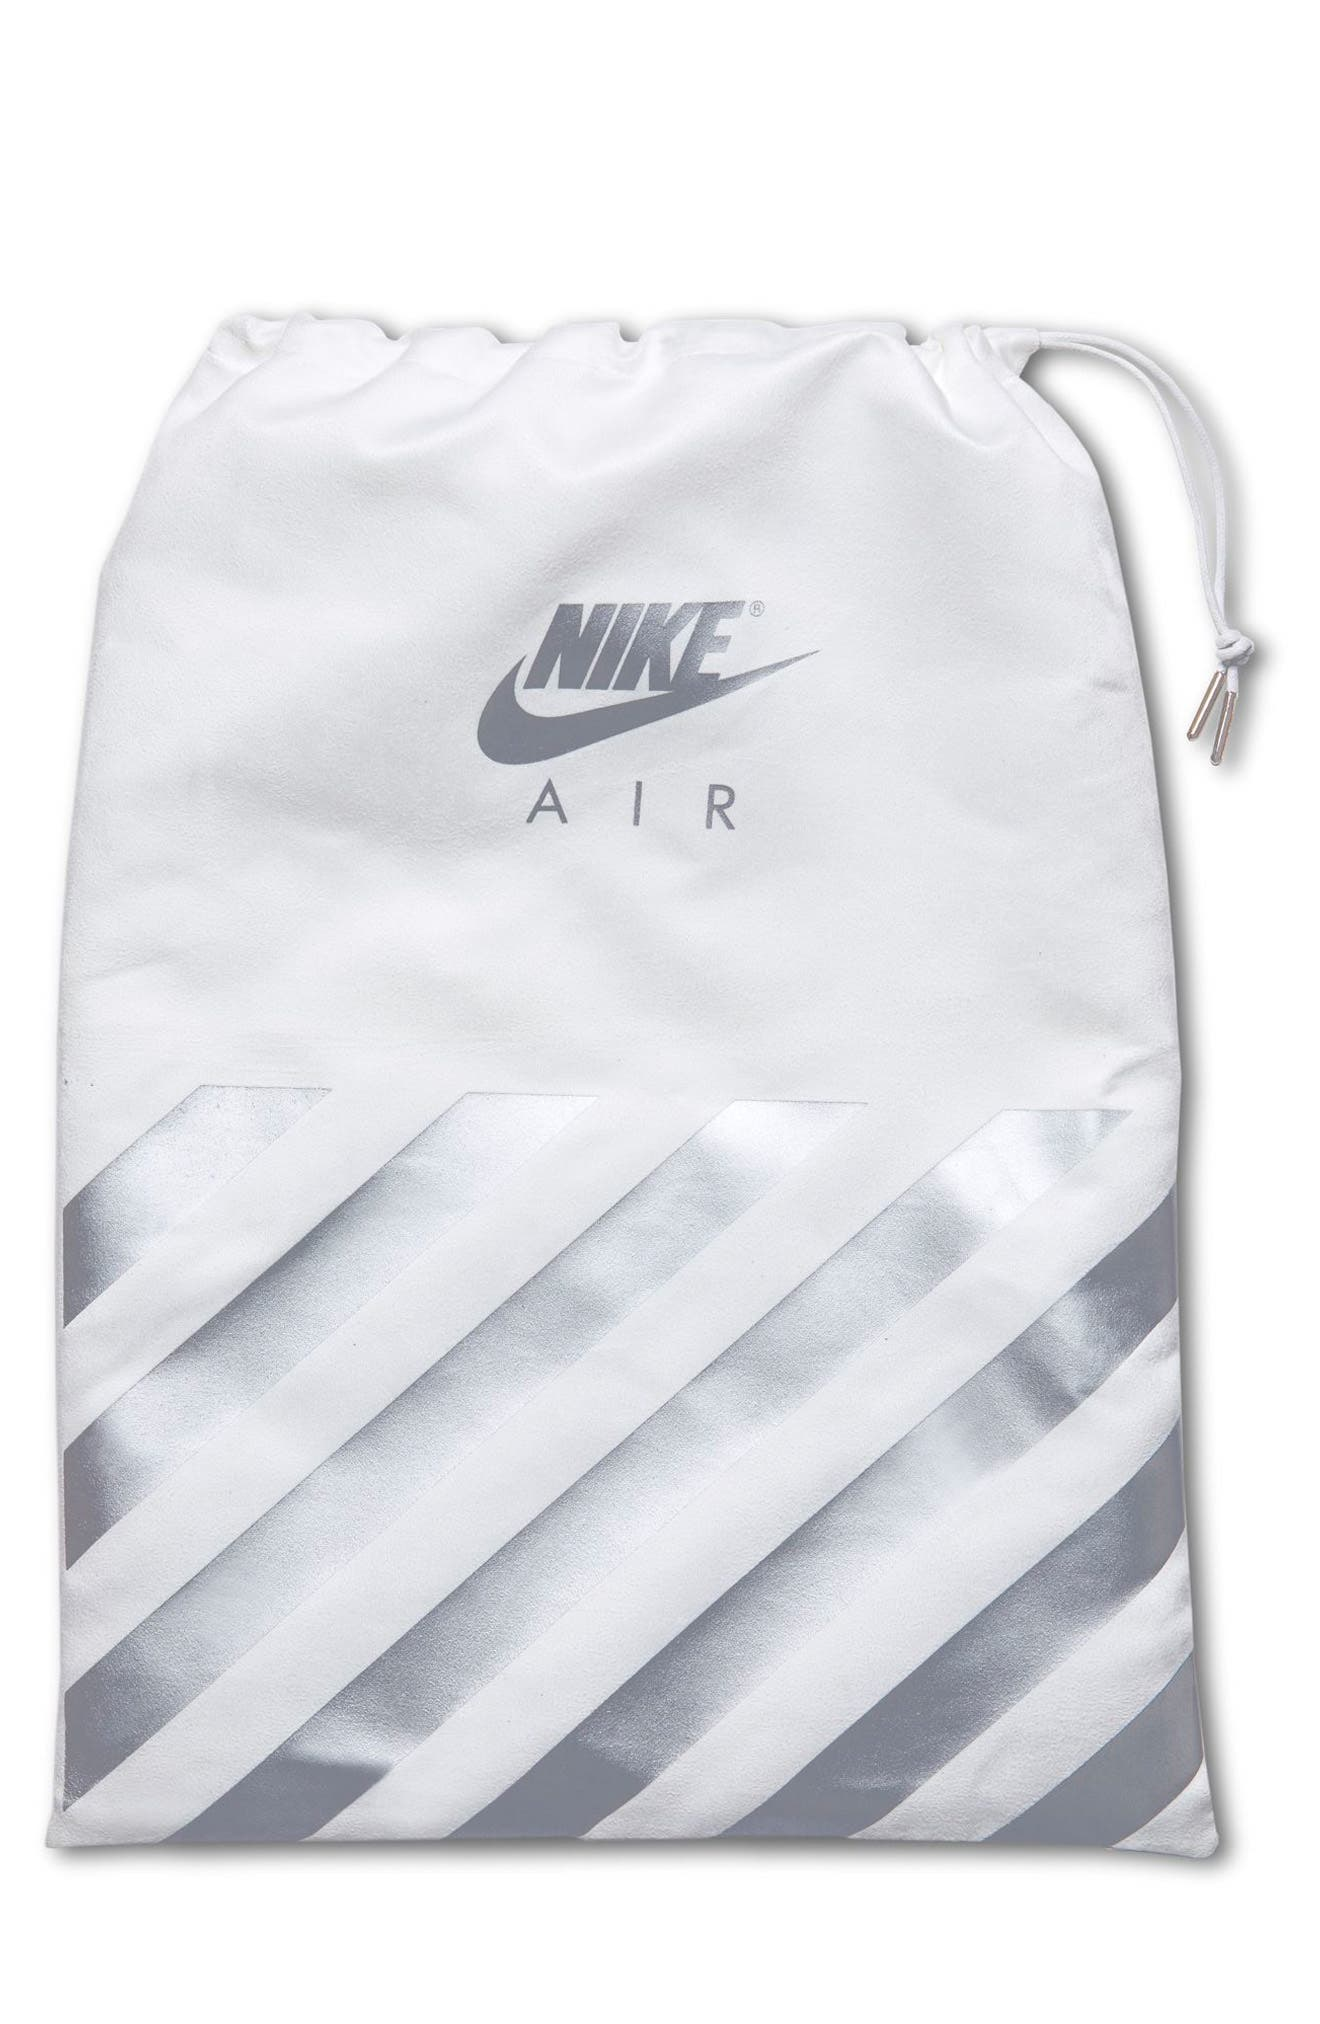 Air Max 1 Anniversary Sneaker,                             Alternate thumbnail 15, color,